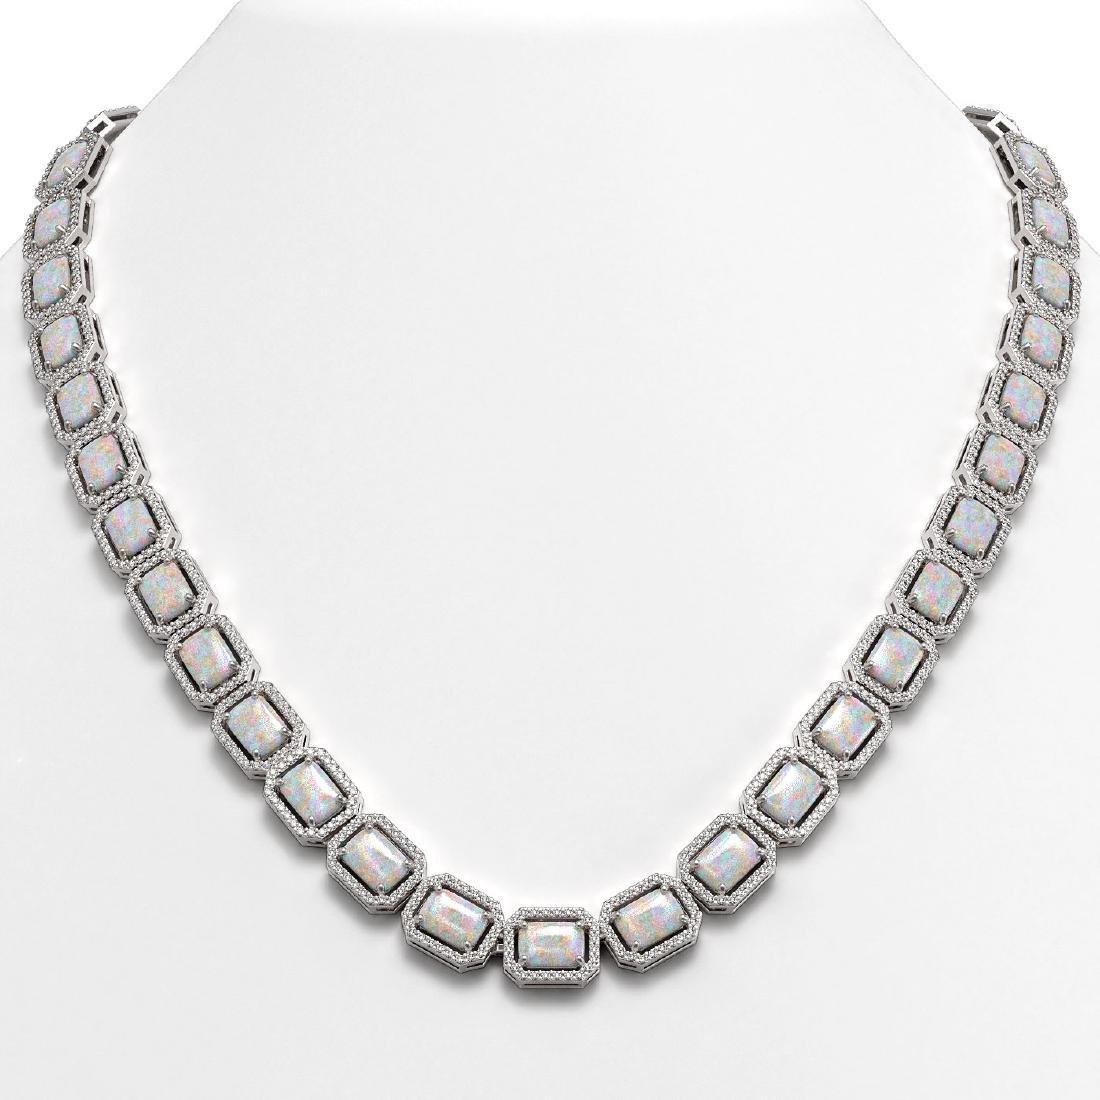 37.69 CTW Opal & Diamond Halo Necklace 10K White Gold